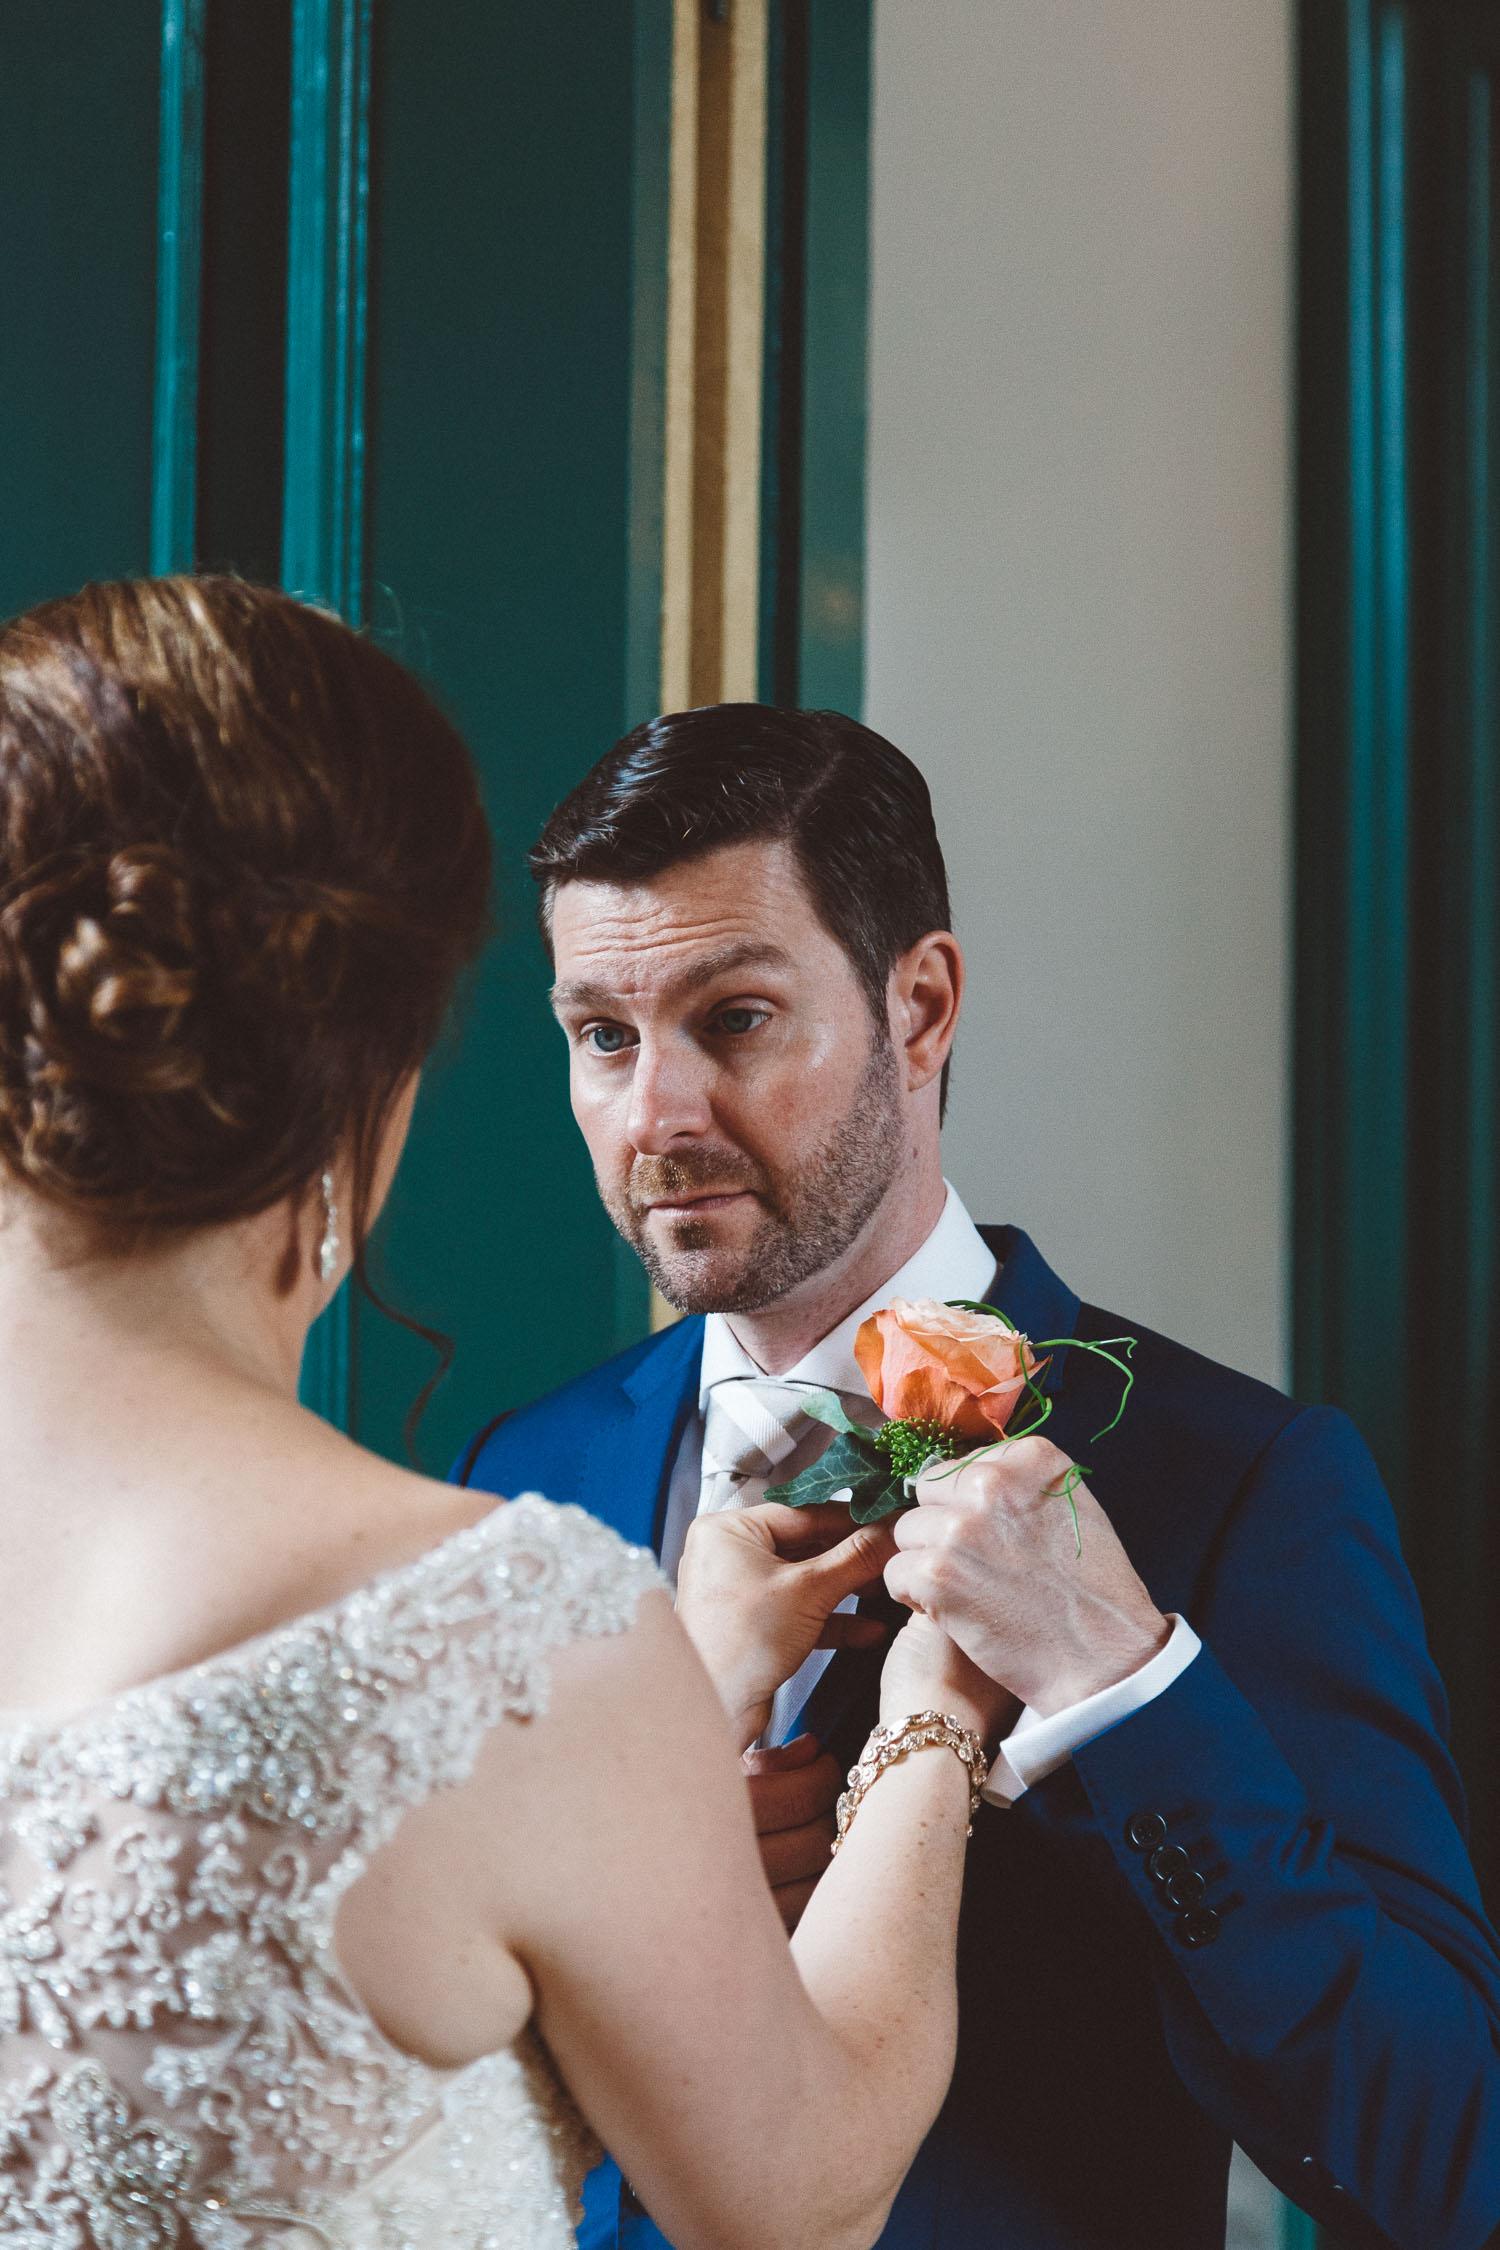 Wedding-huwelijk-trouwen-bruiloft-photography-fotografie-fotograaf-photographer-Huize-Frankendael-On-a-hazy-morning-Amsterdam-The-Netherlands-13.jpg